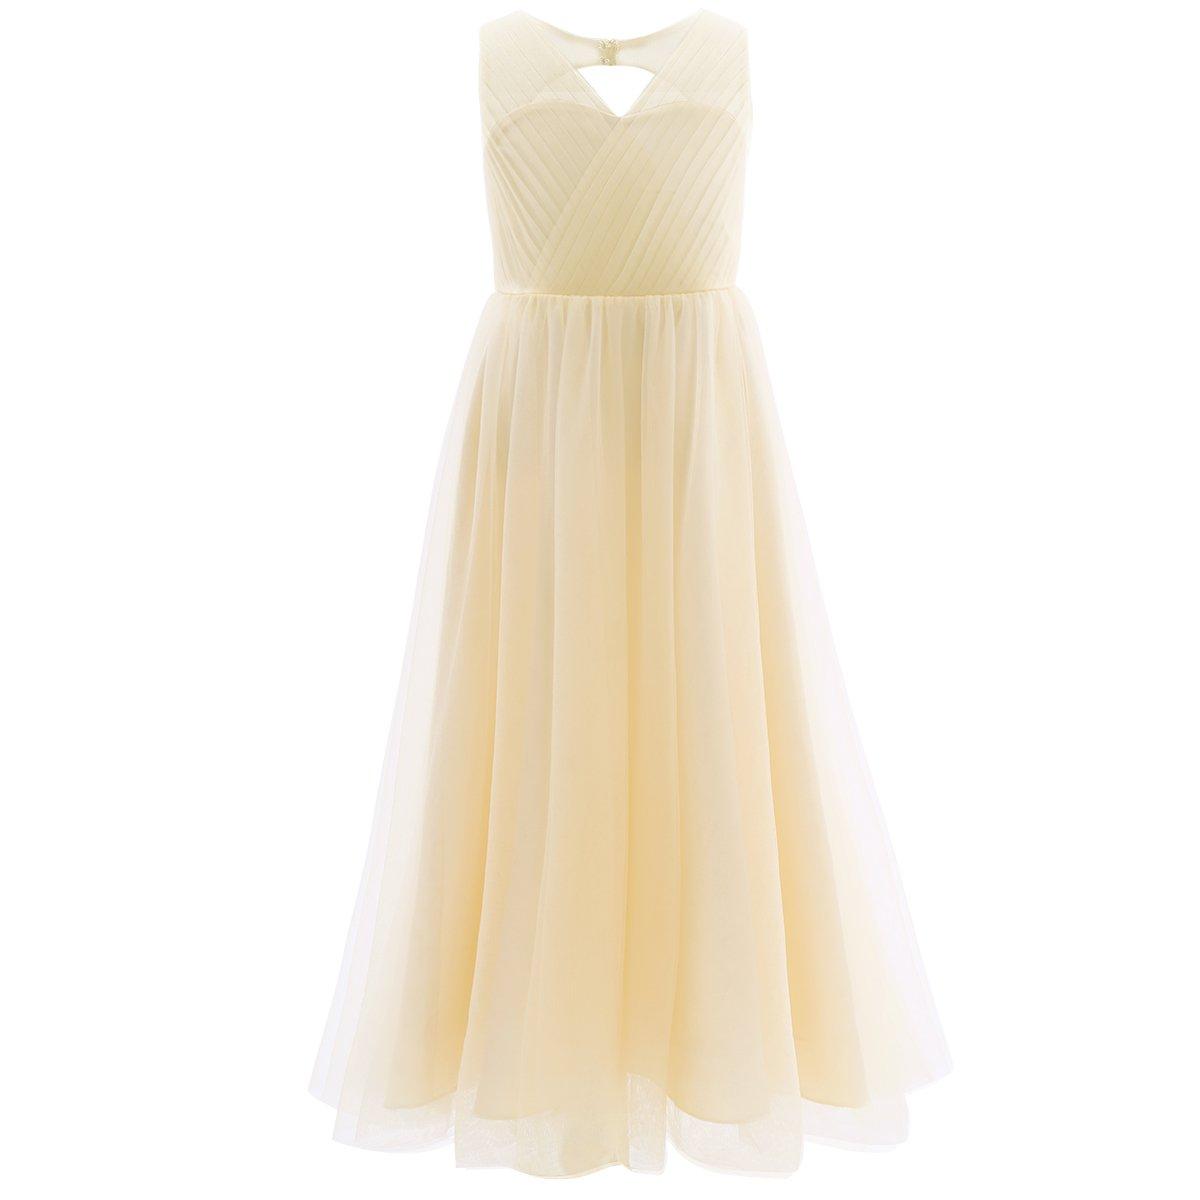 b5726e715f Top 10 wholesale Mesh Top Wedding Dress - Chinabrands.com